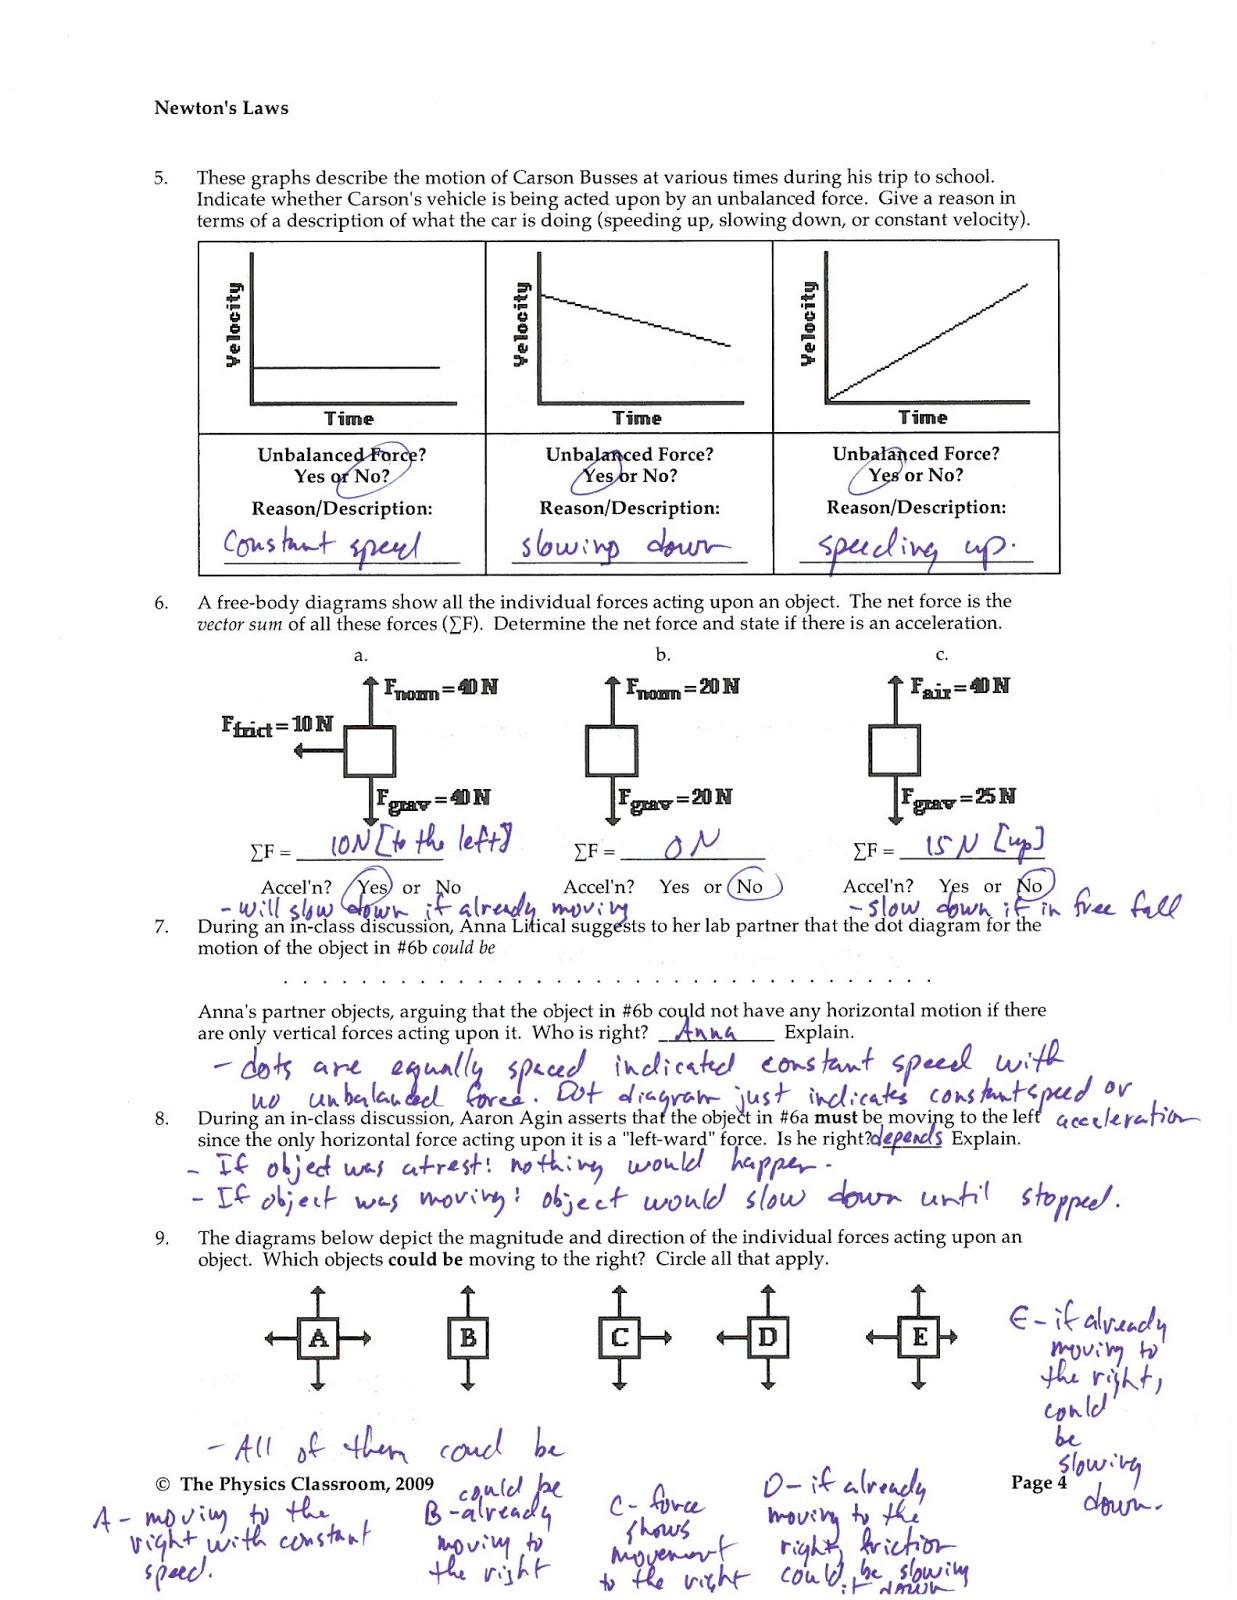 mr kasprick s science 10 class fm4 explore the relationship